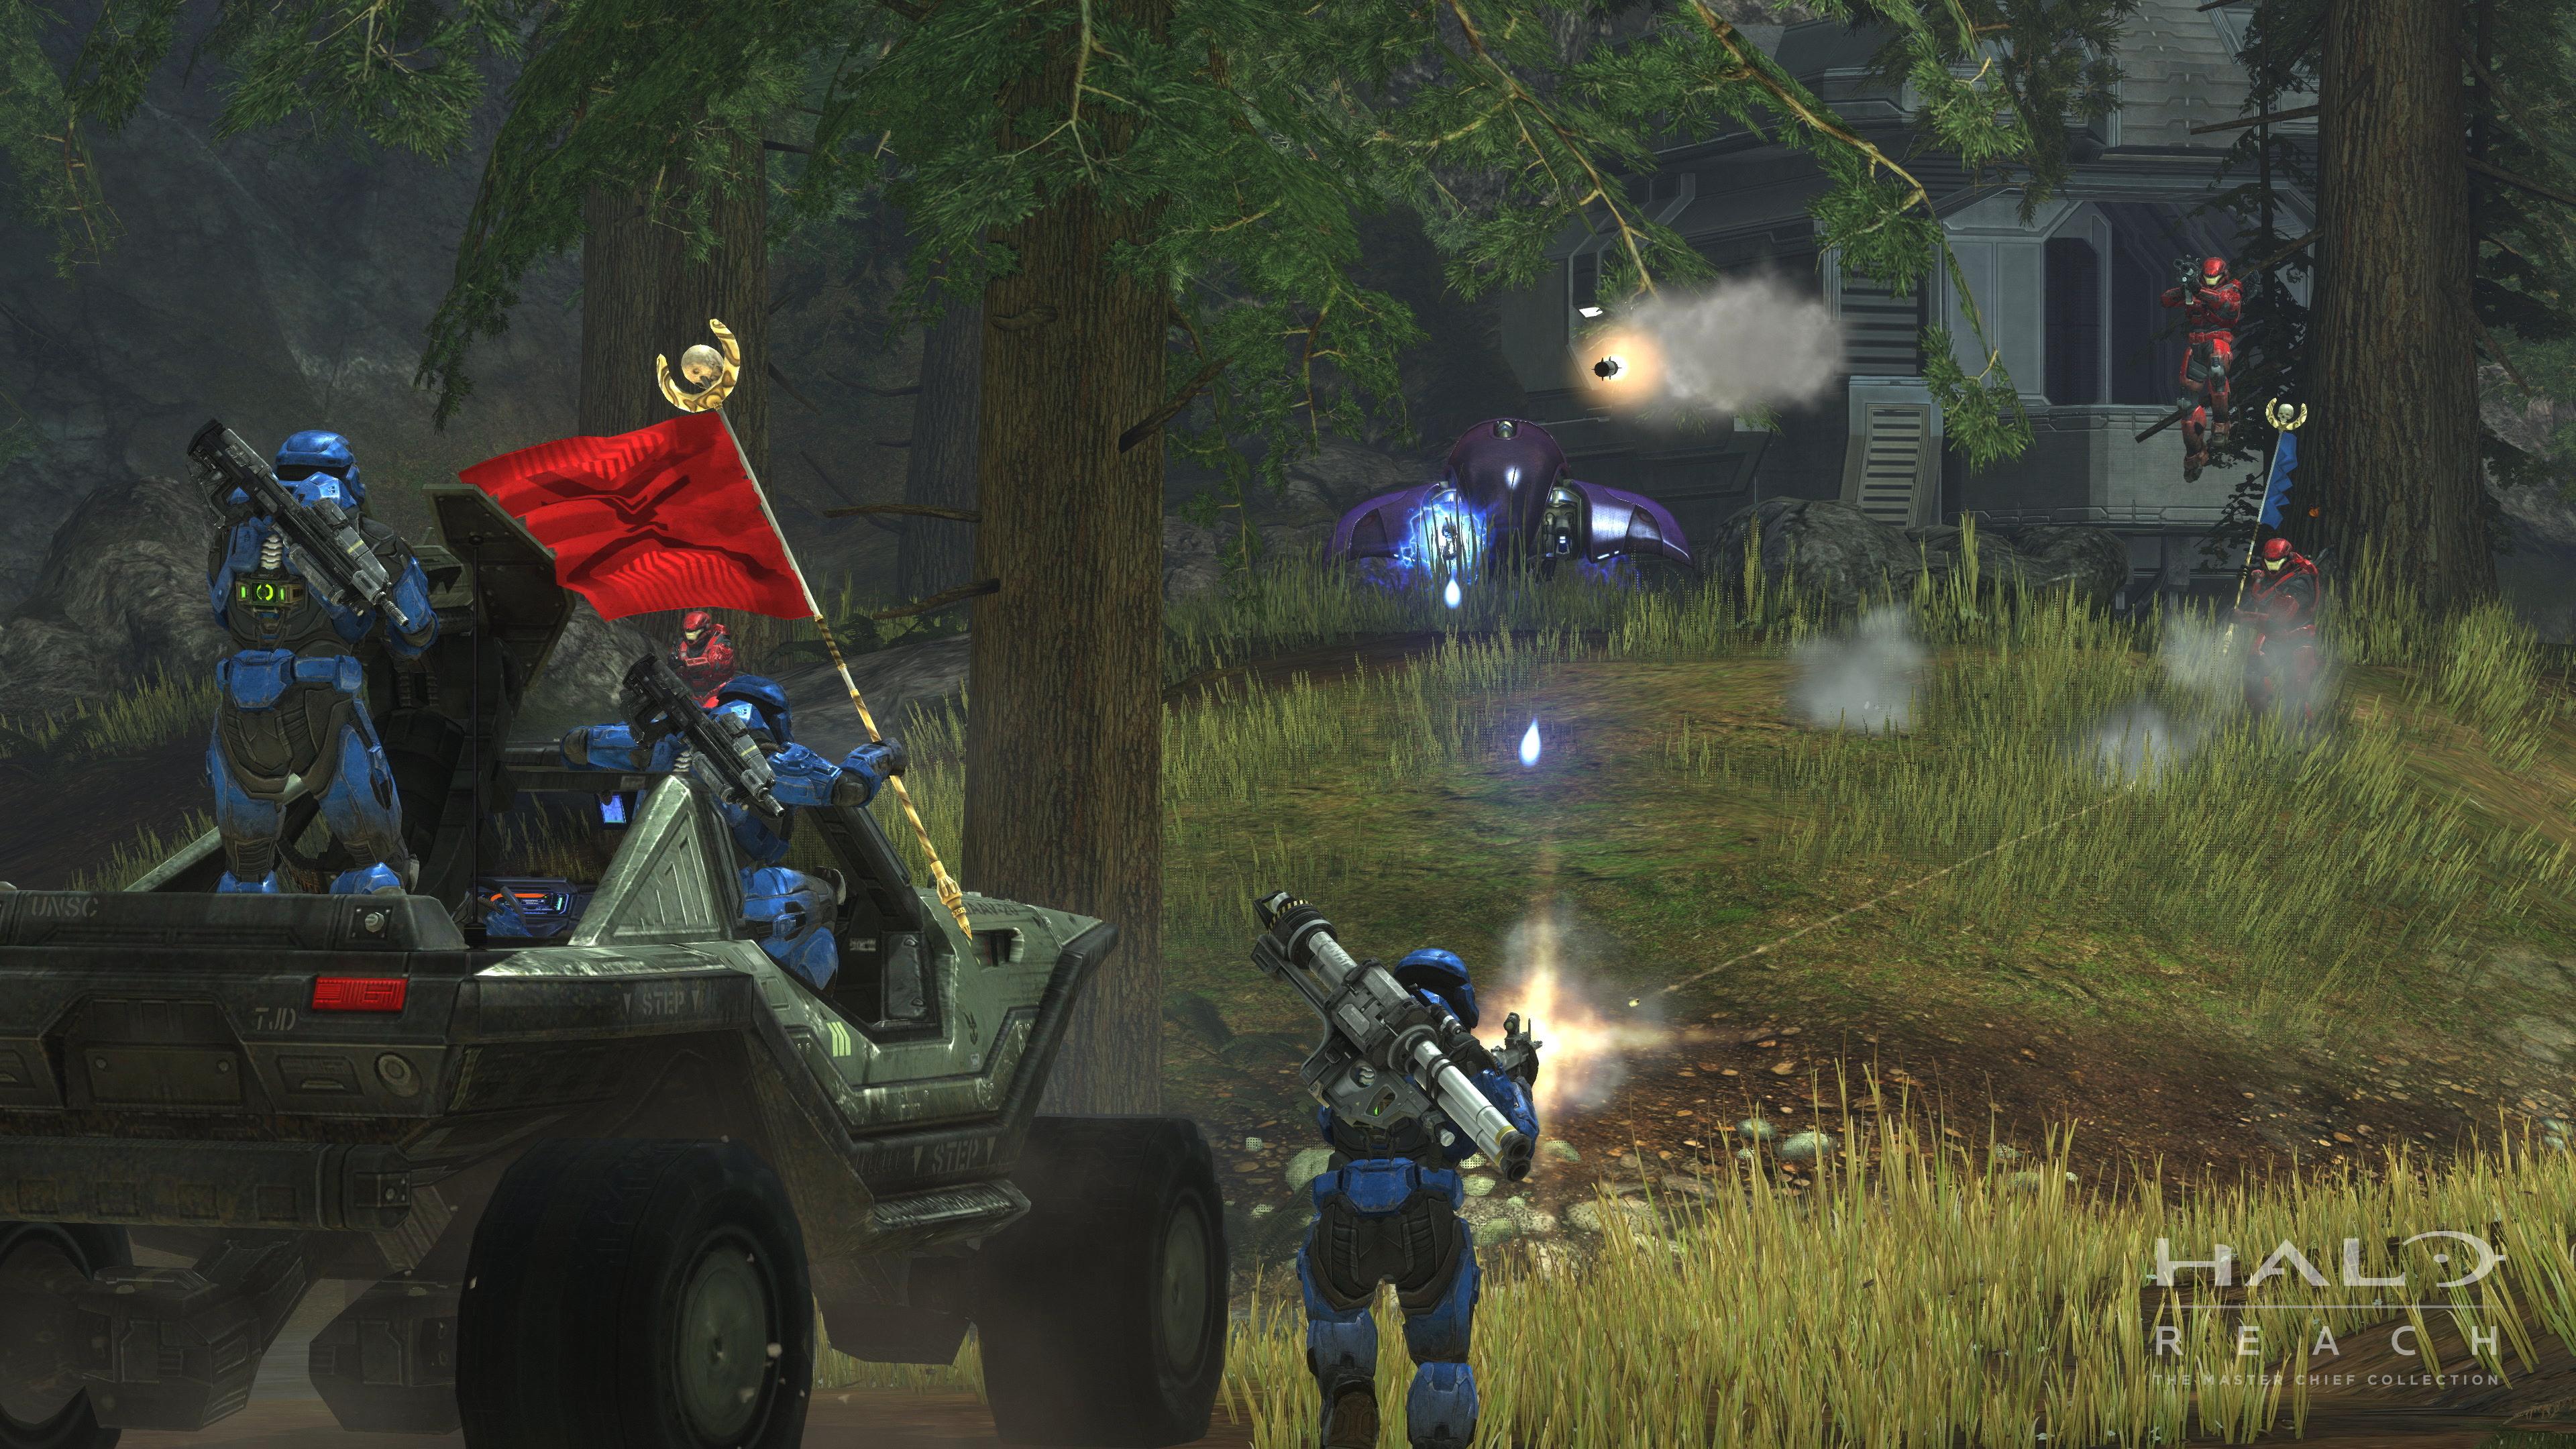 Halo-Master-Chief-Collection-2019_Reach-Multiplayer_01_4K_WM